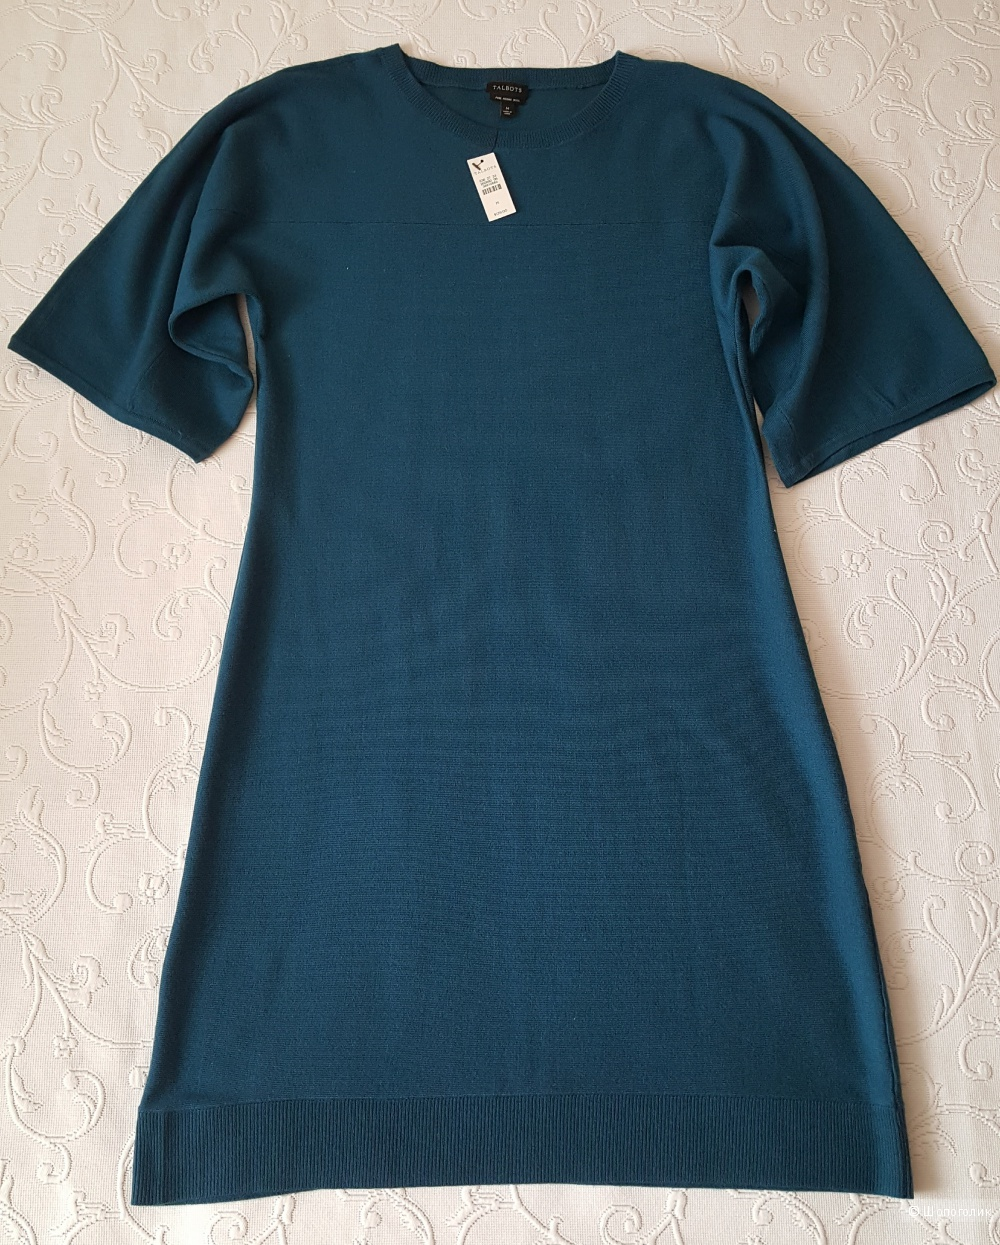 Шерстяное платье Talbots р. M